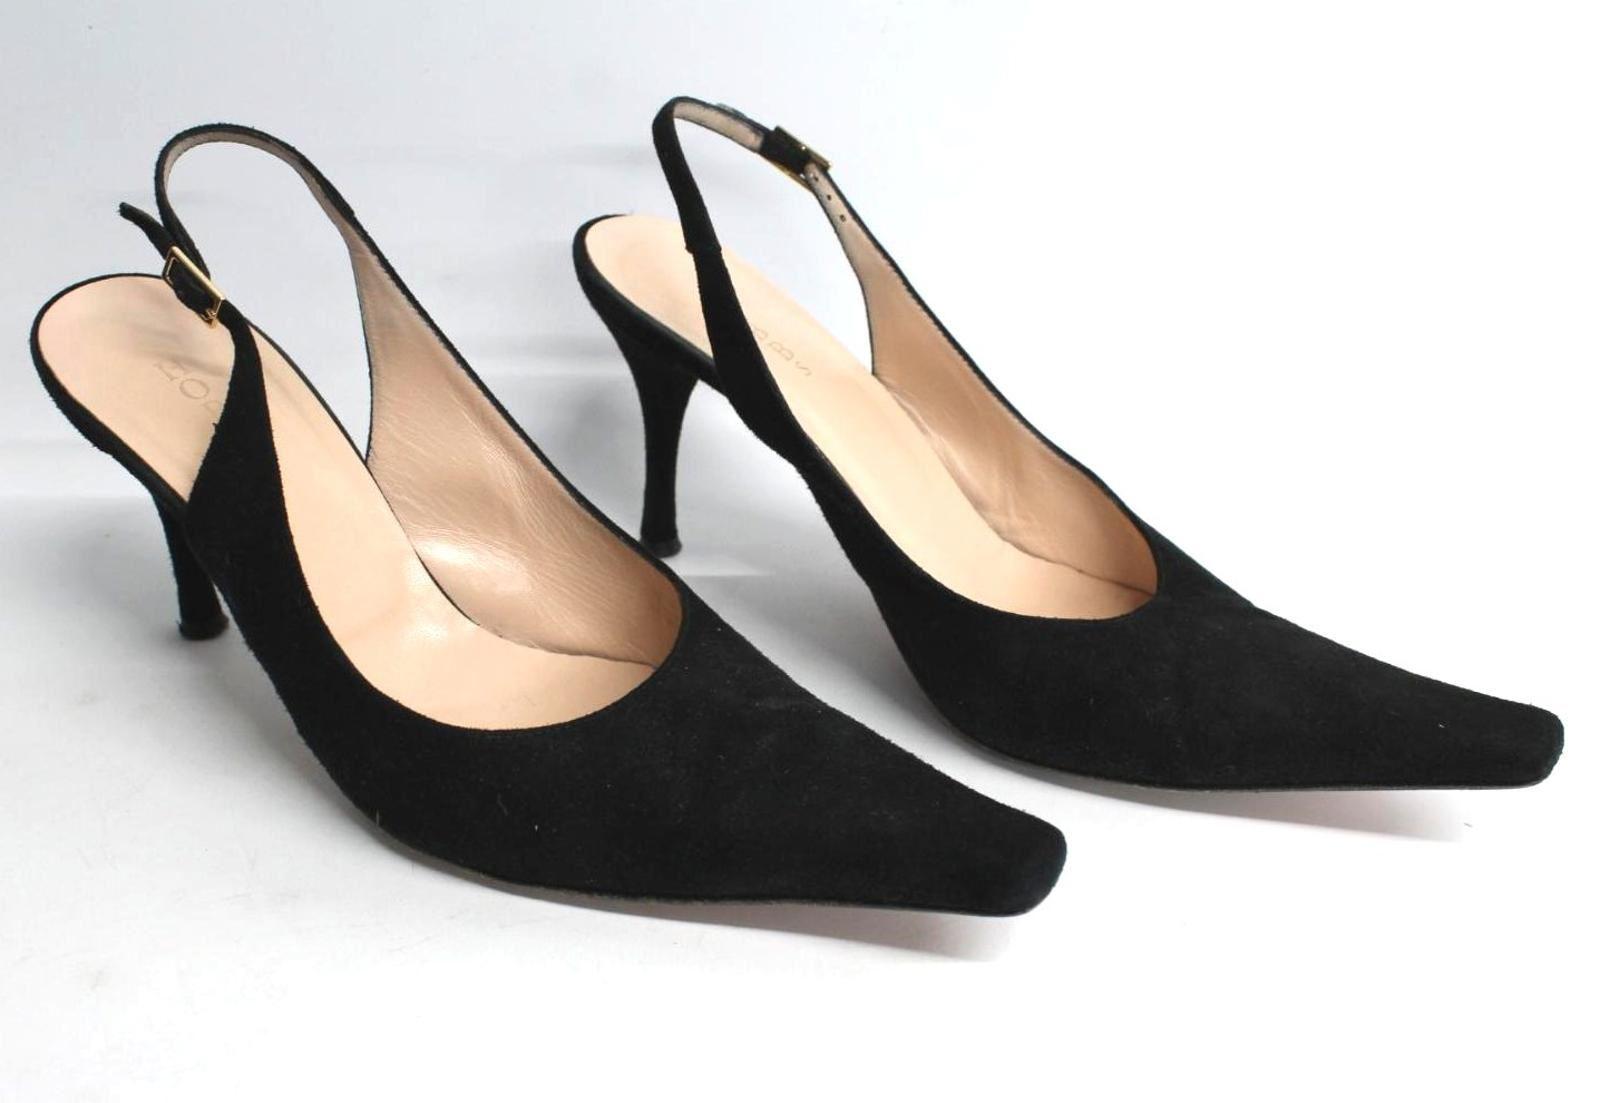 Hobbs-femmes-en-daim-noir-Sling-Arriere-bout-pointu-et-talon-aiguille-Chaussure-UK6-5-EU39-5